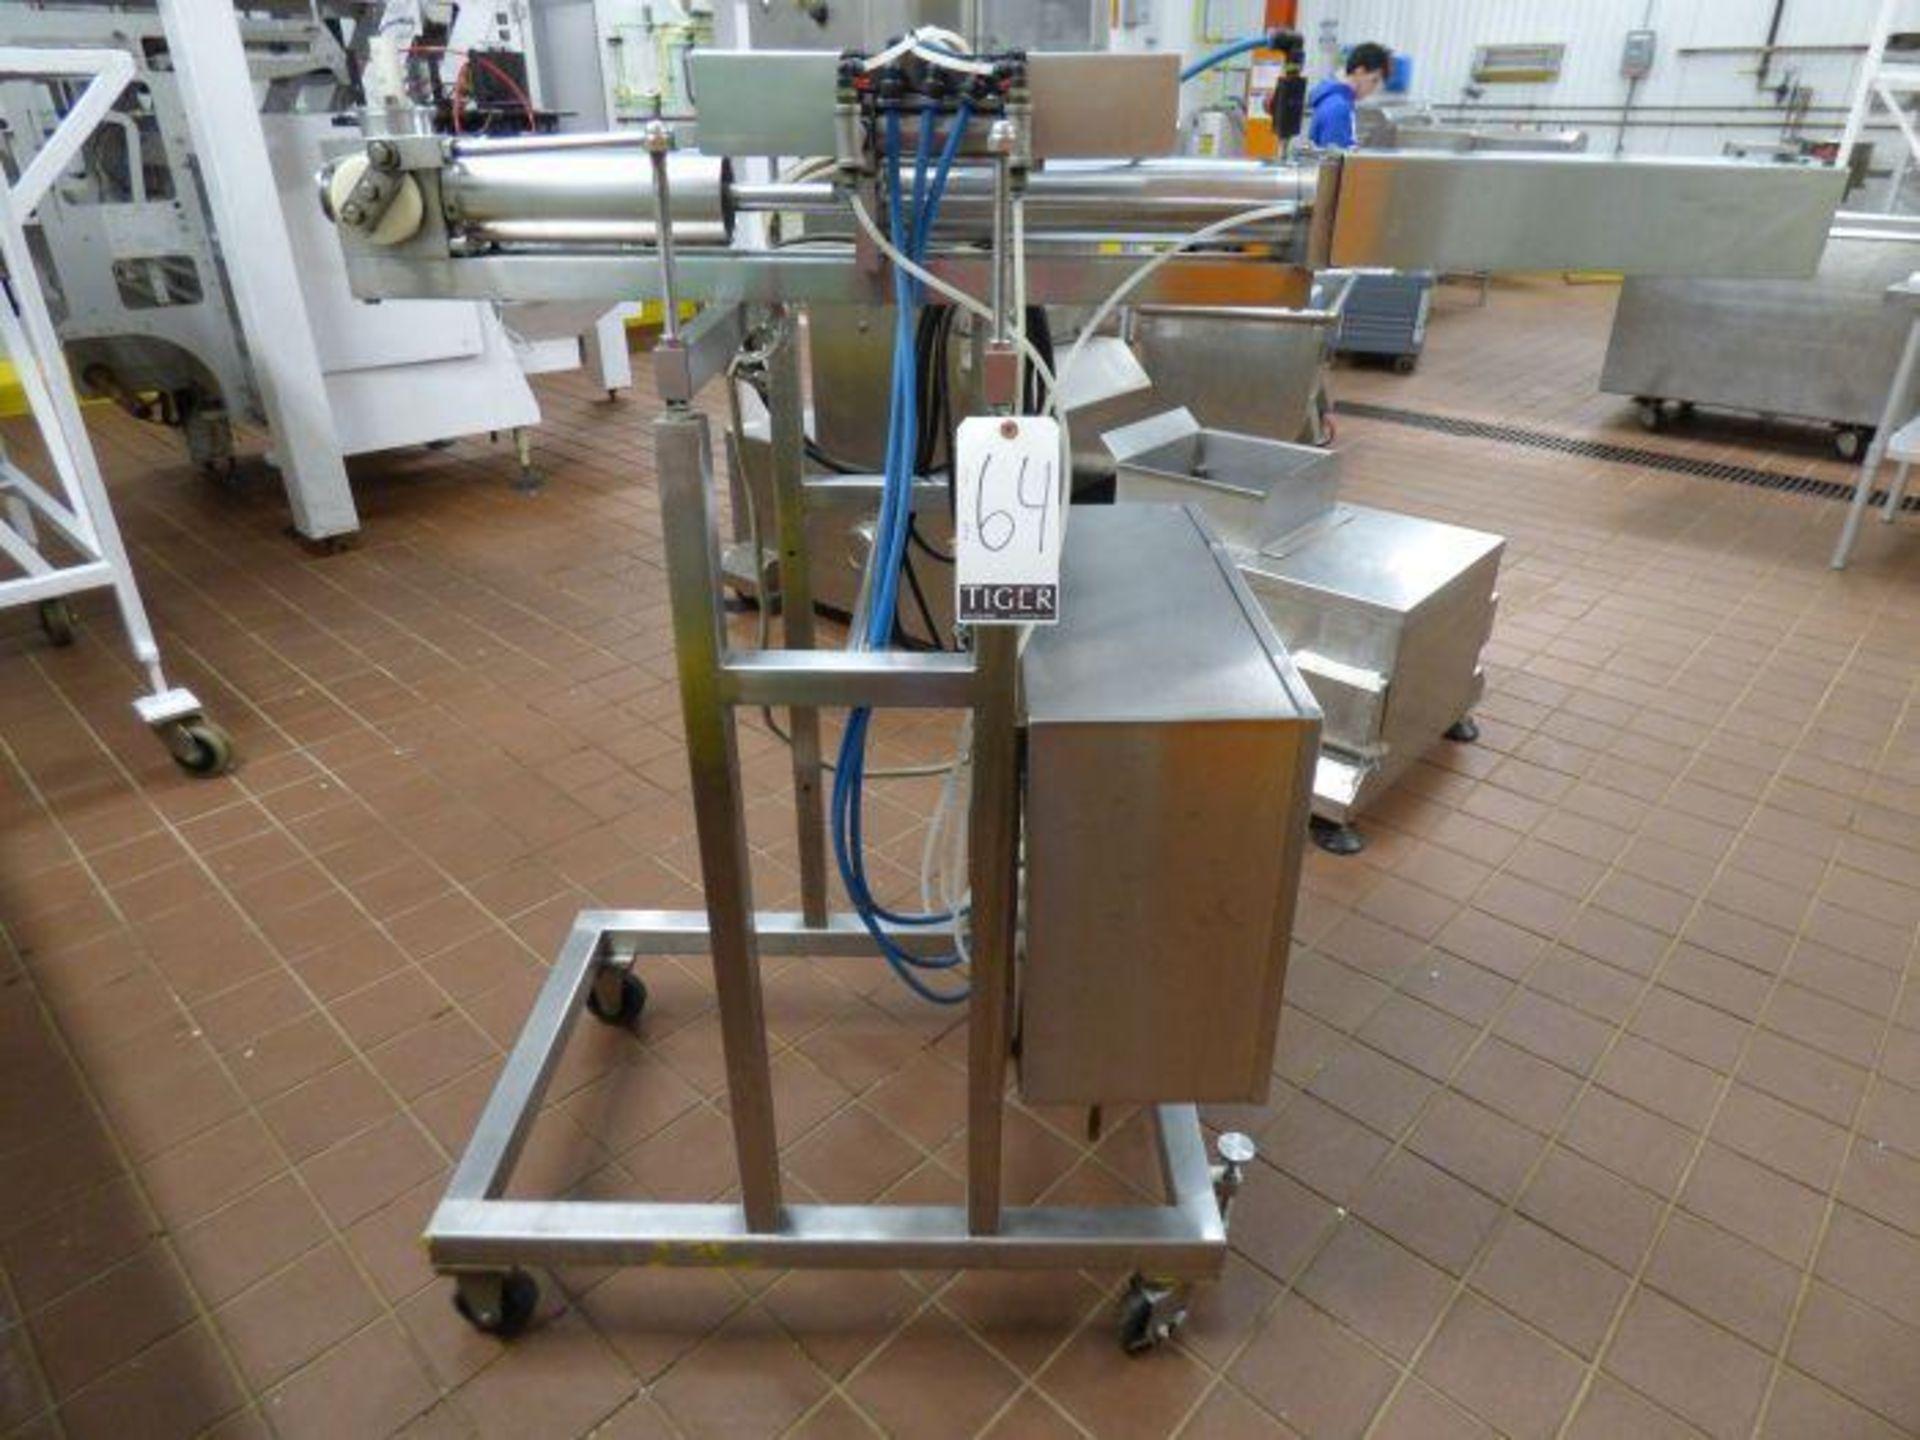 Lot 1074 - Autoprod Stainless Steel Horizontal Single Tube Piston Filler